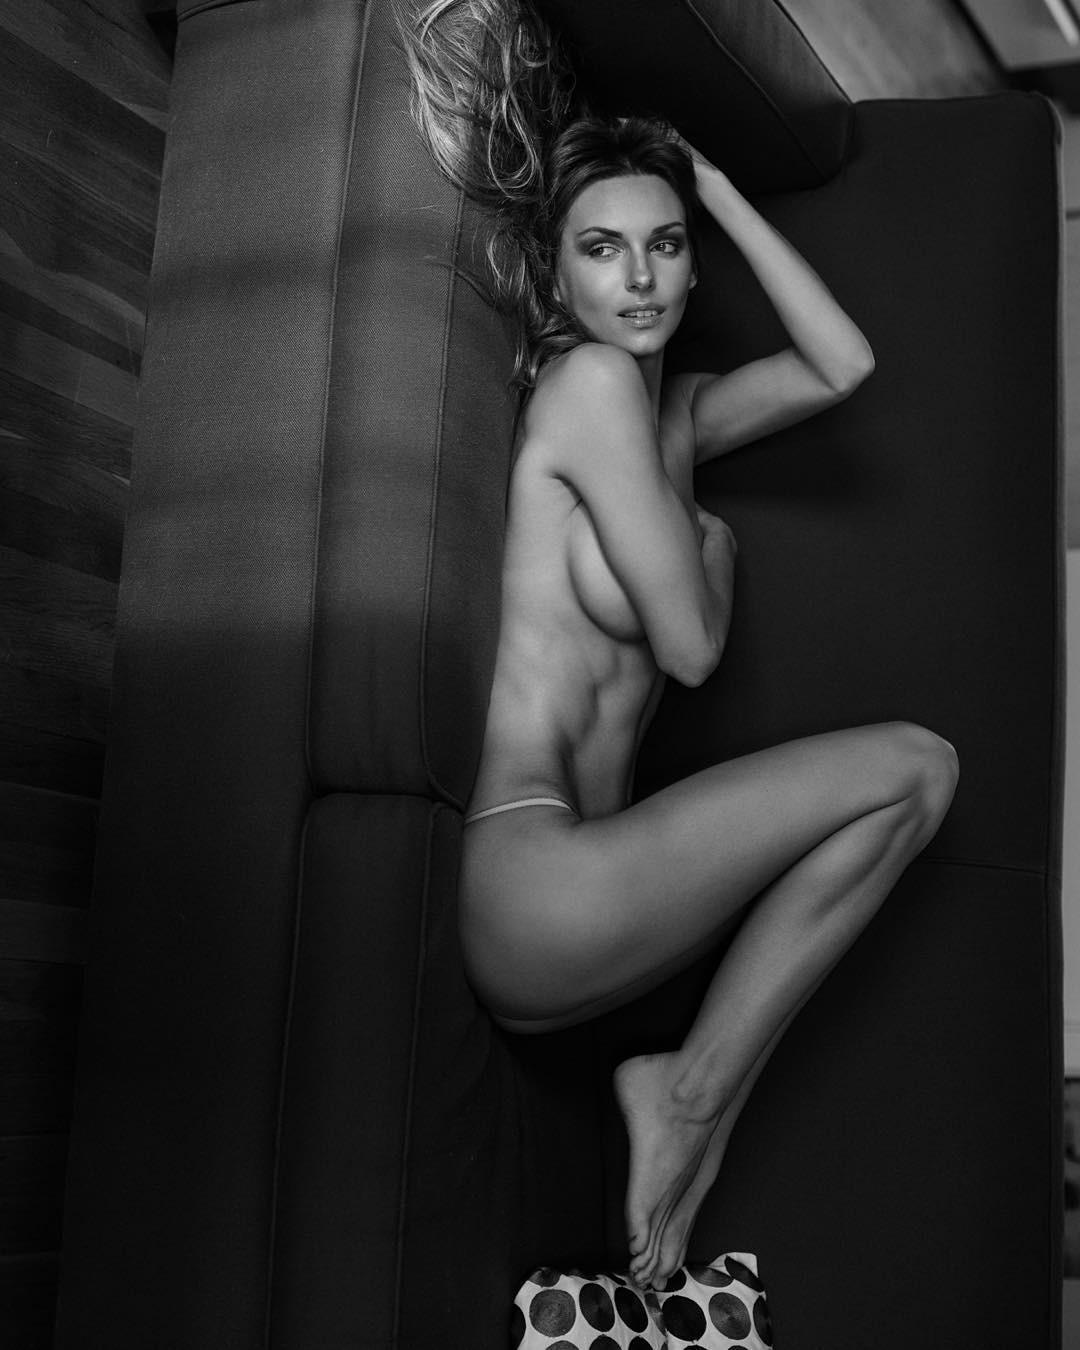 Mila nude photos-7364